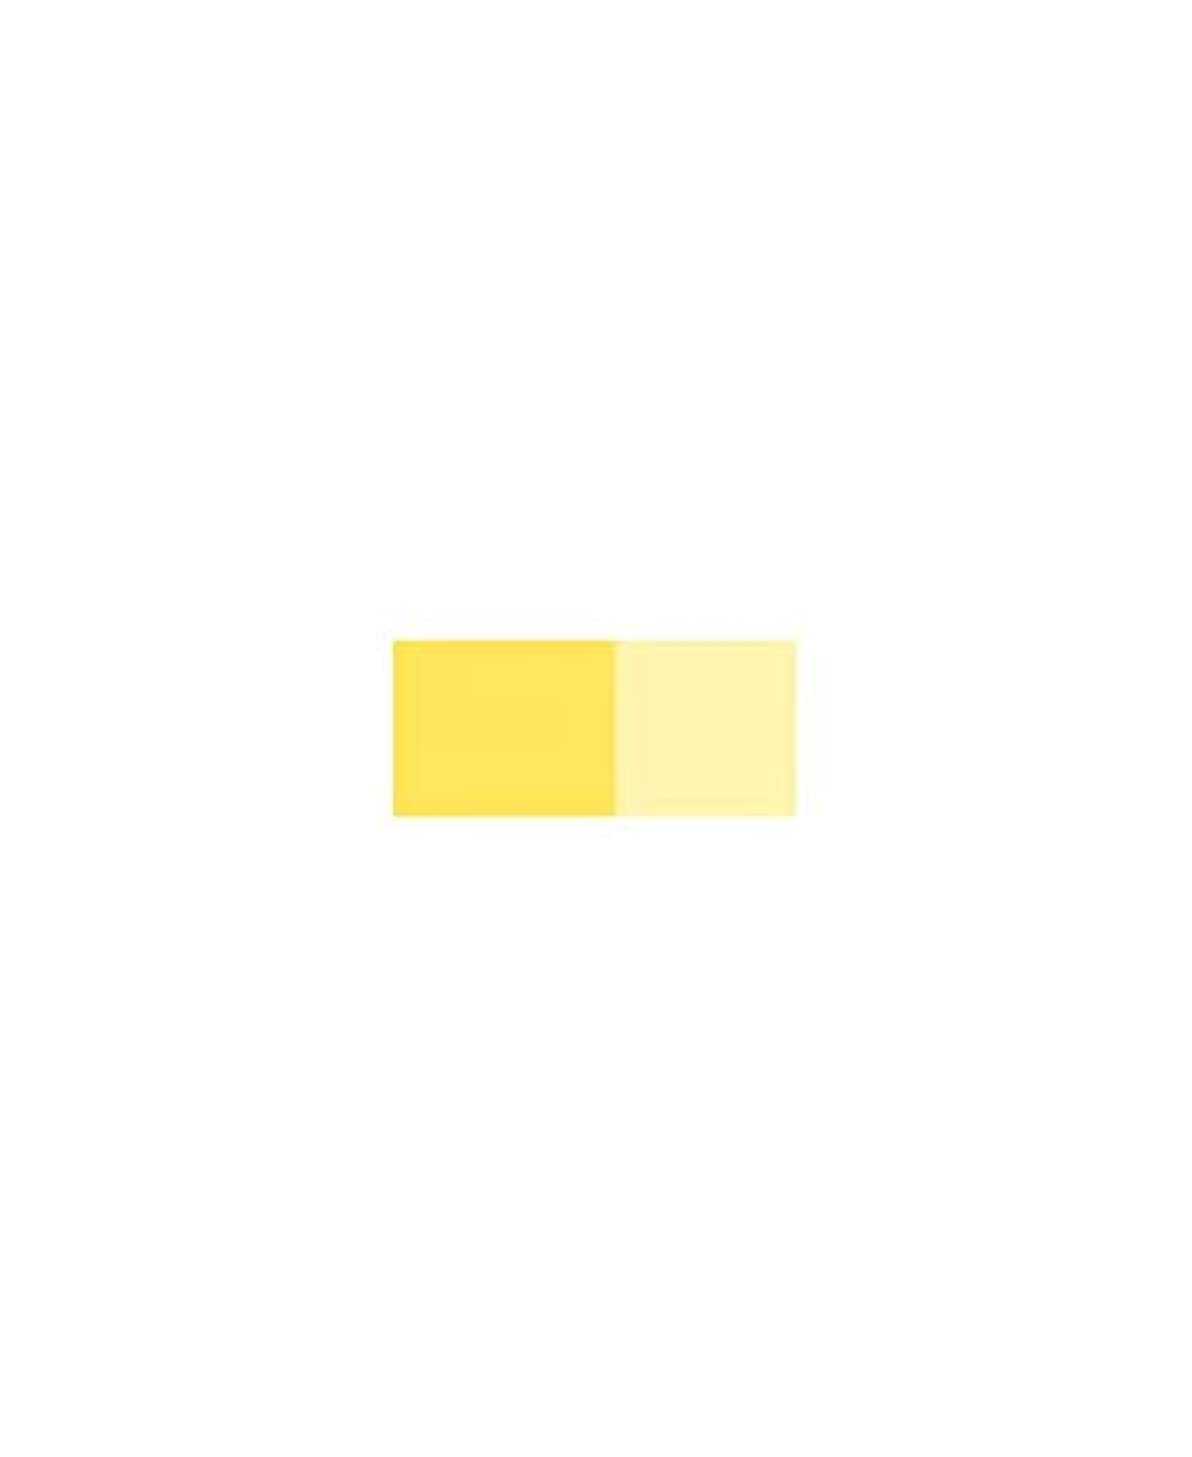 Lefranc & Bourgeois - Flashe Matte Artist's Color - 125ml Jar - Senegal Yellow